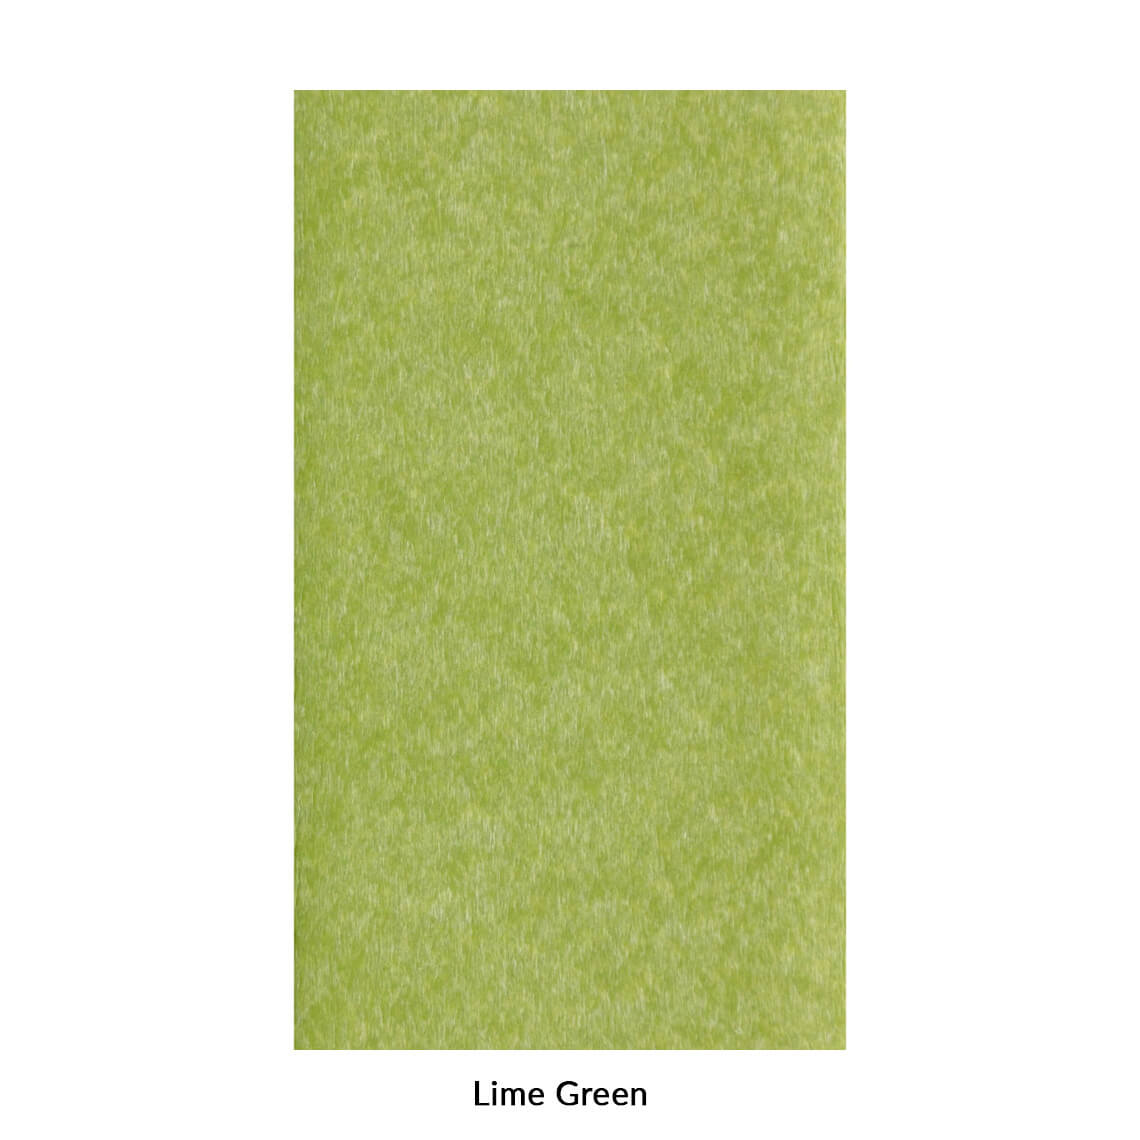 26.-lime-green.jpg